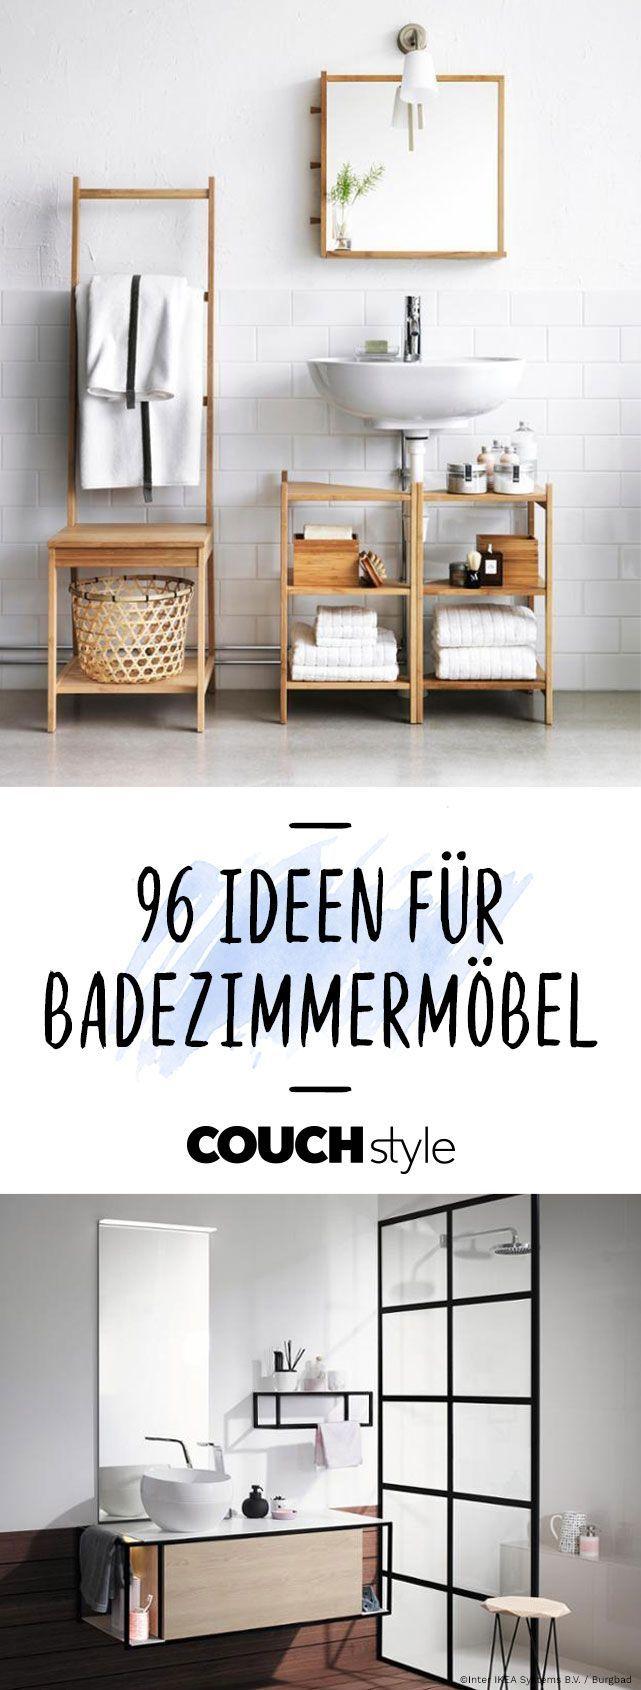 256 best Badezimmer images on Pinterest | Bathrooms, Frames and ...